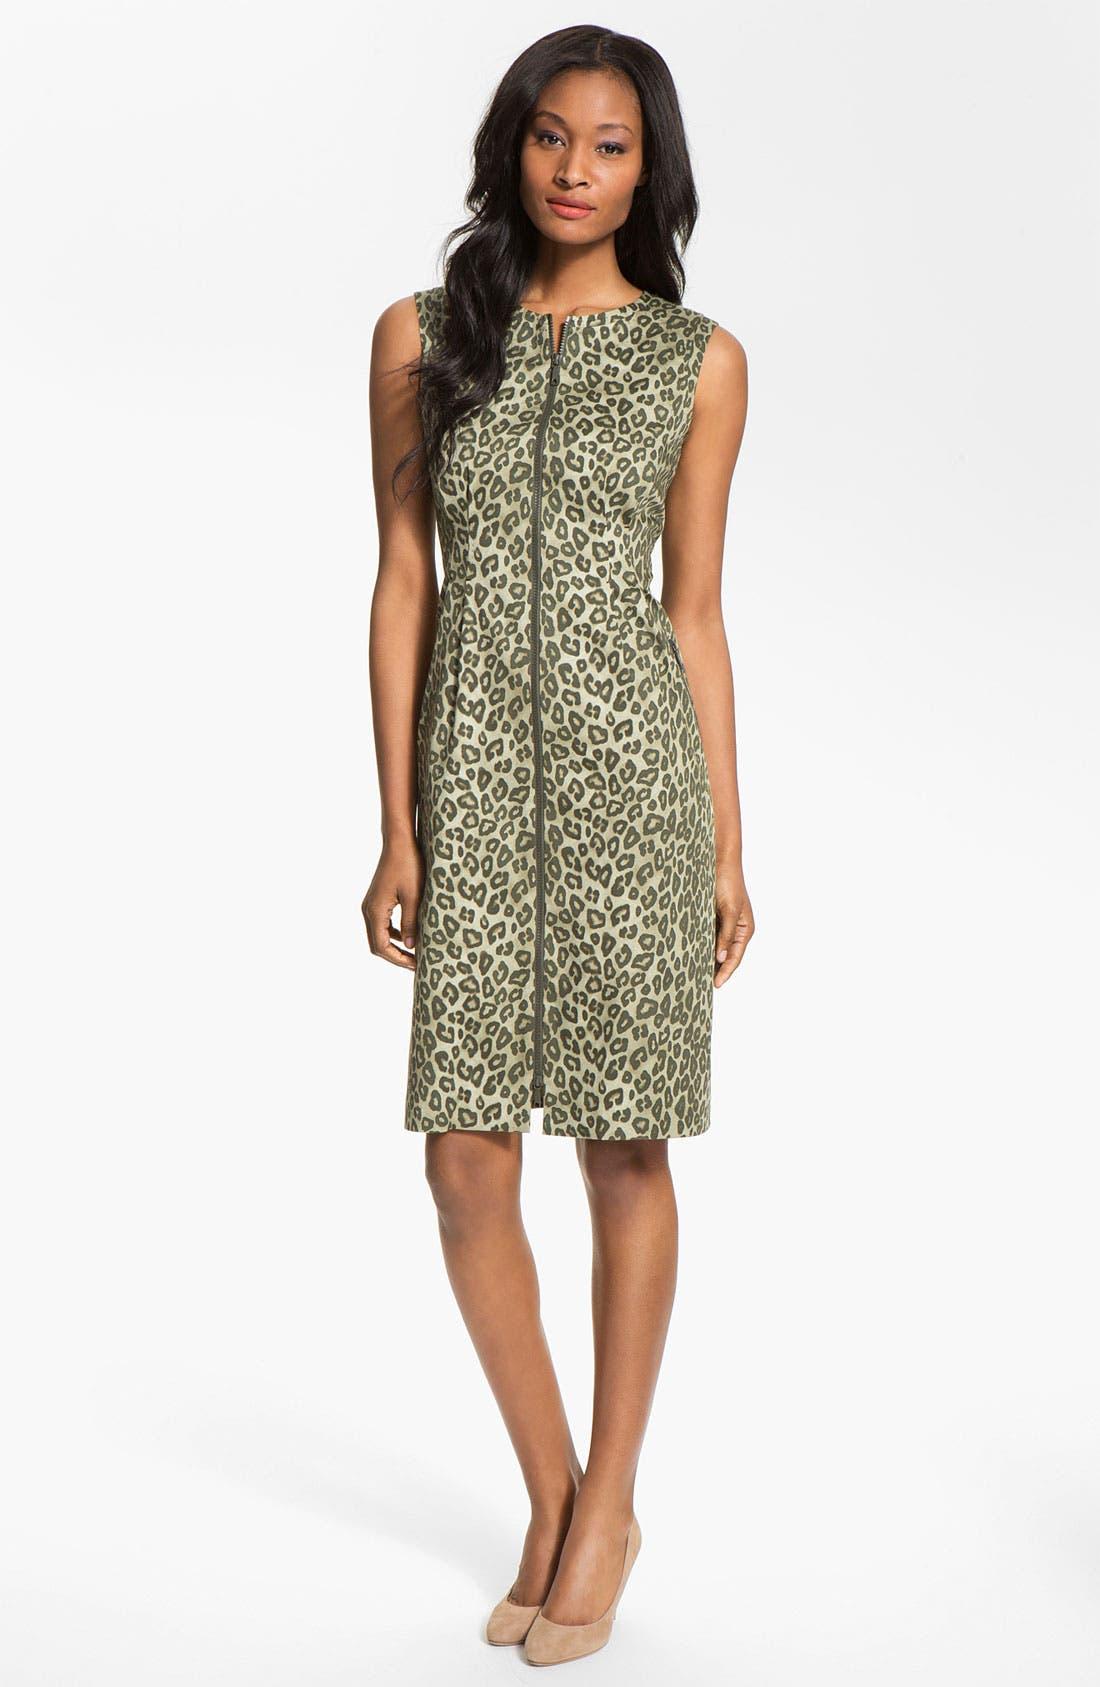 Main Image - Lafayette 148 New York 'Misti - Senegal Cheetah' Dress